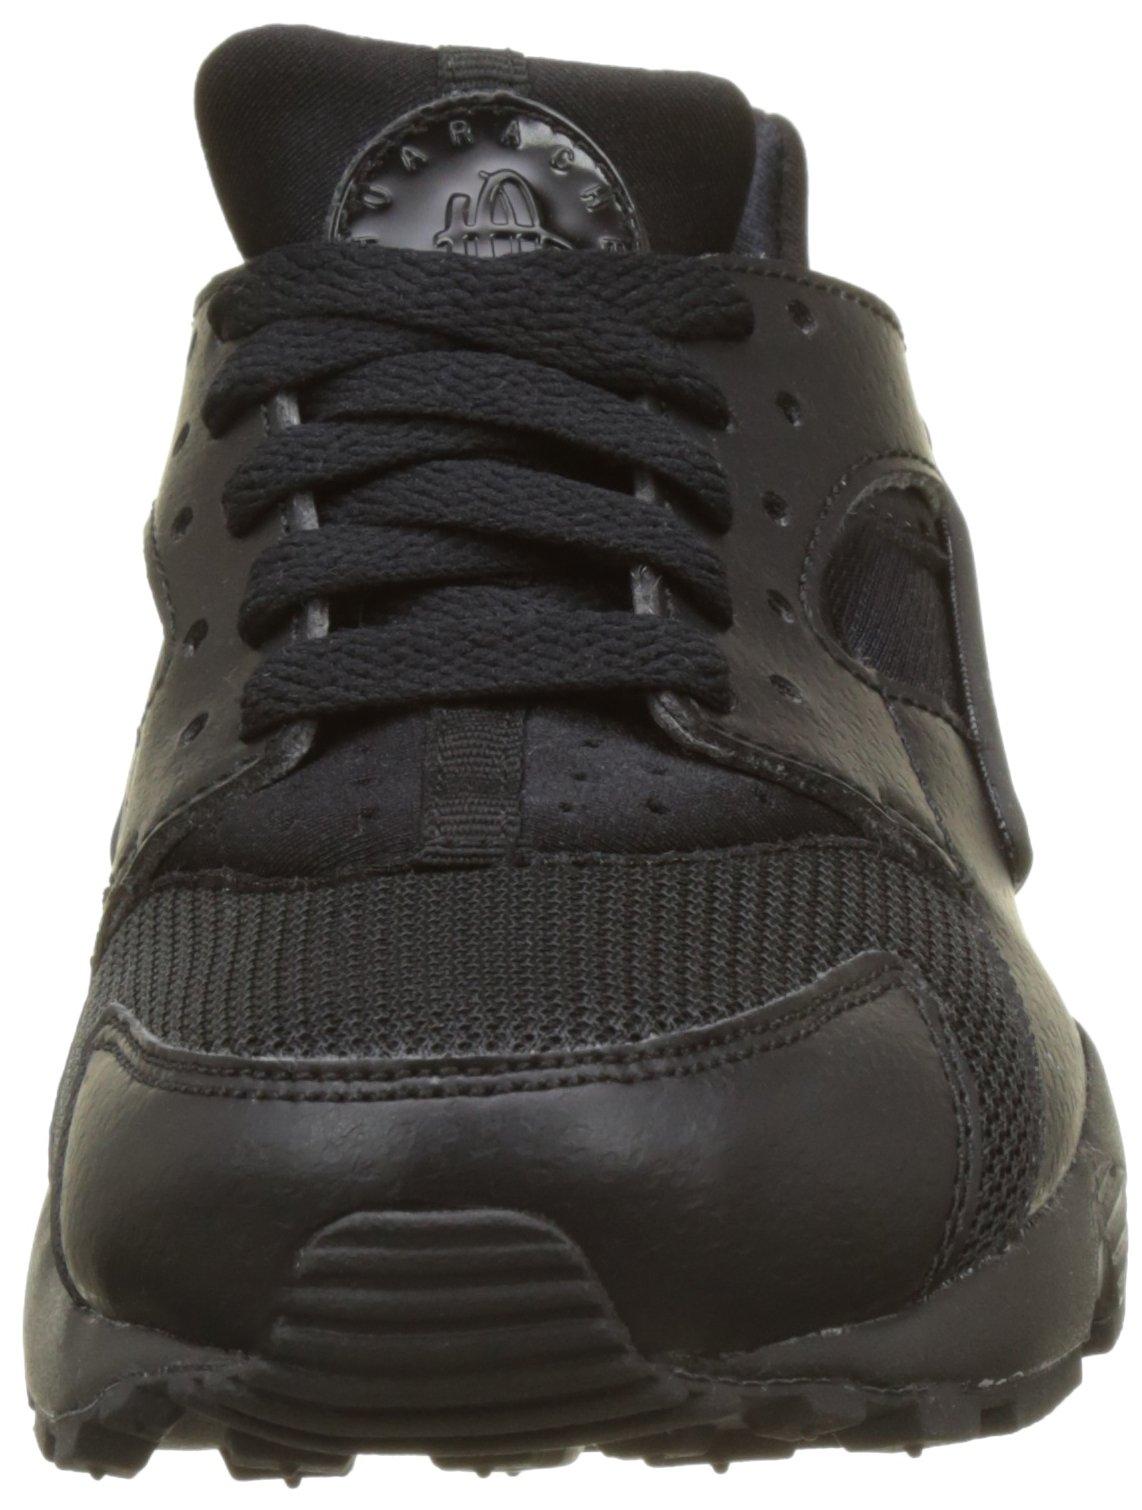 71Sl0eIMvqL - Nike Huarache Run (GS), Boys' Running Shoes